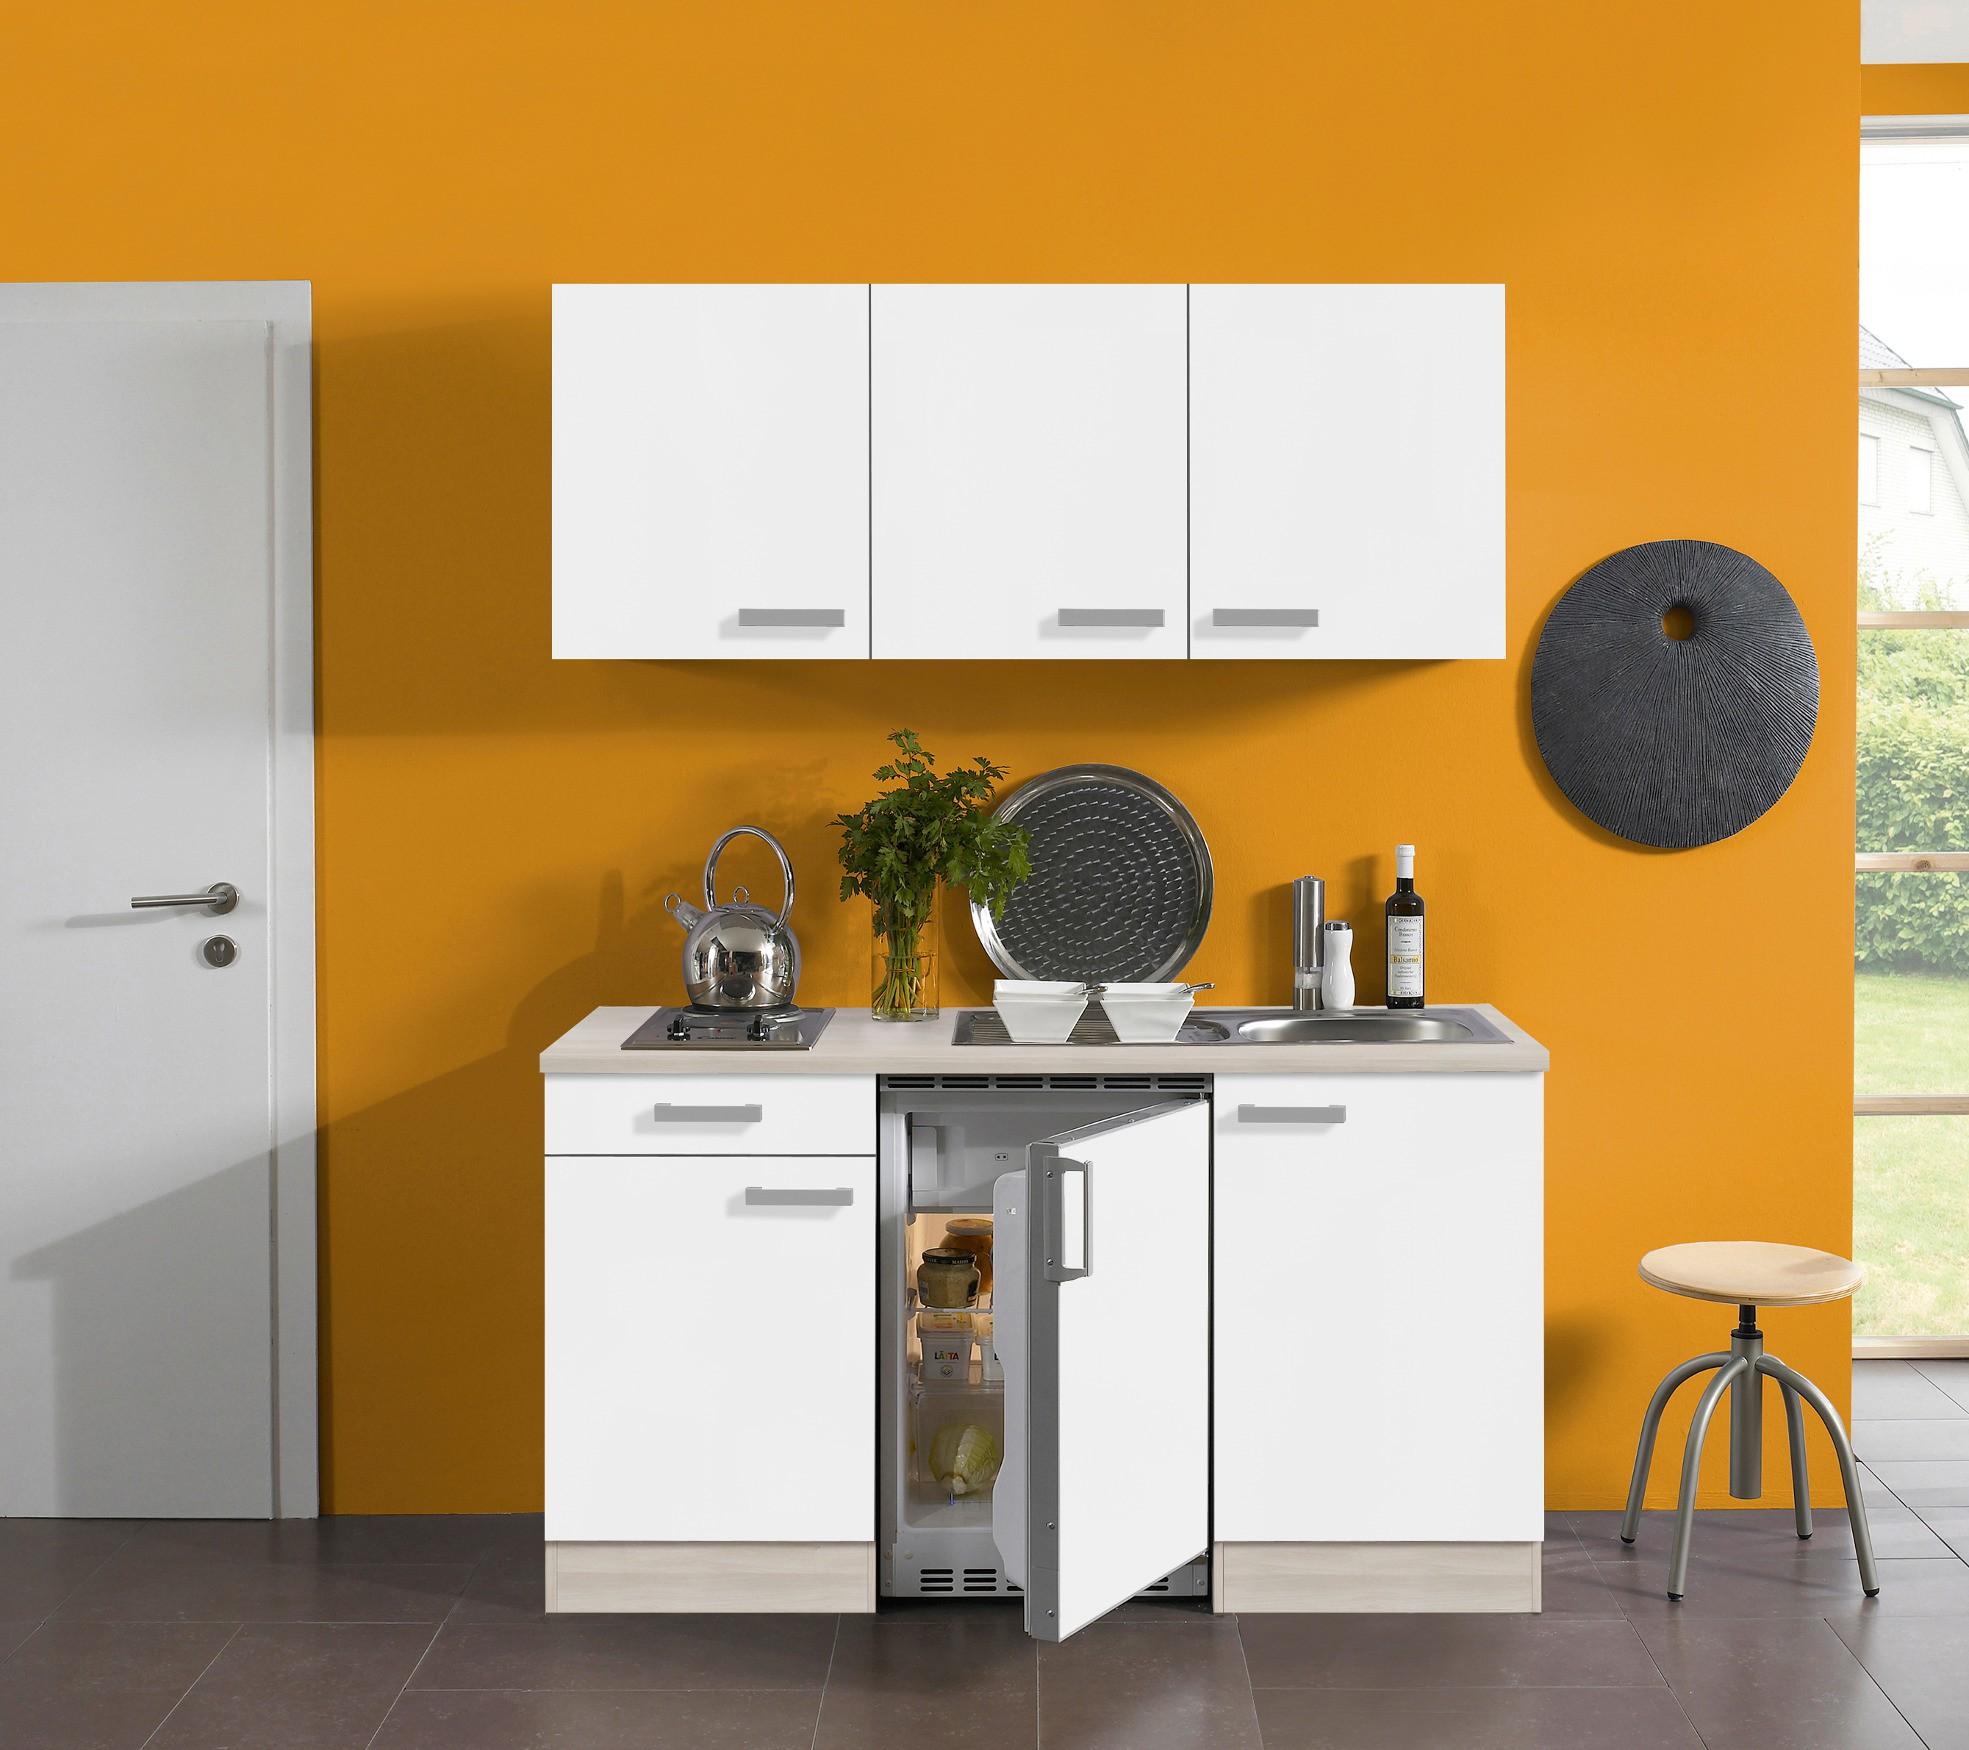 singlek che barcelona mit elektro kochfeld 8 teilig breite 150 cm wei k che. Black Bedroom Furniture Sets. Home Design Ideas